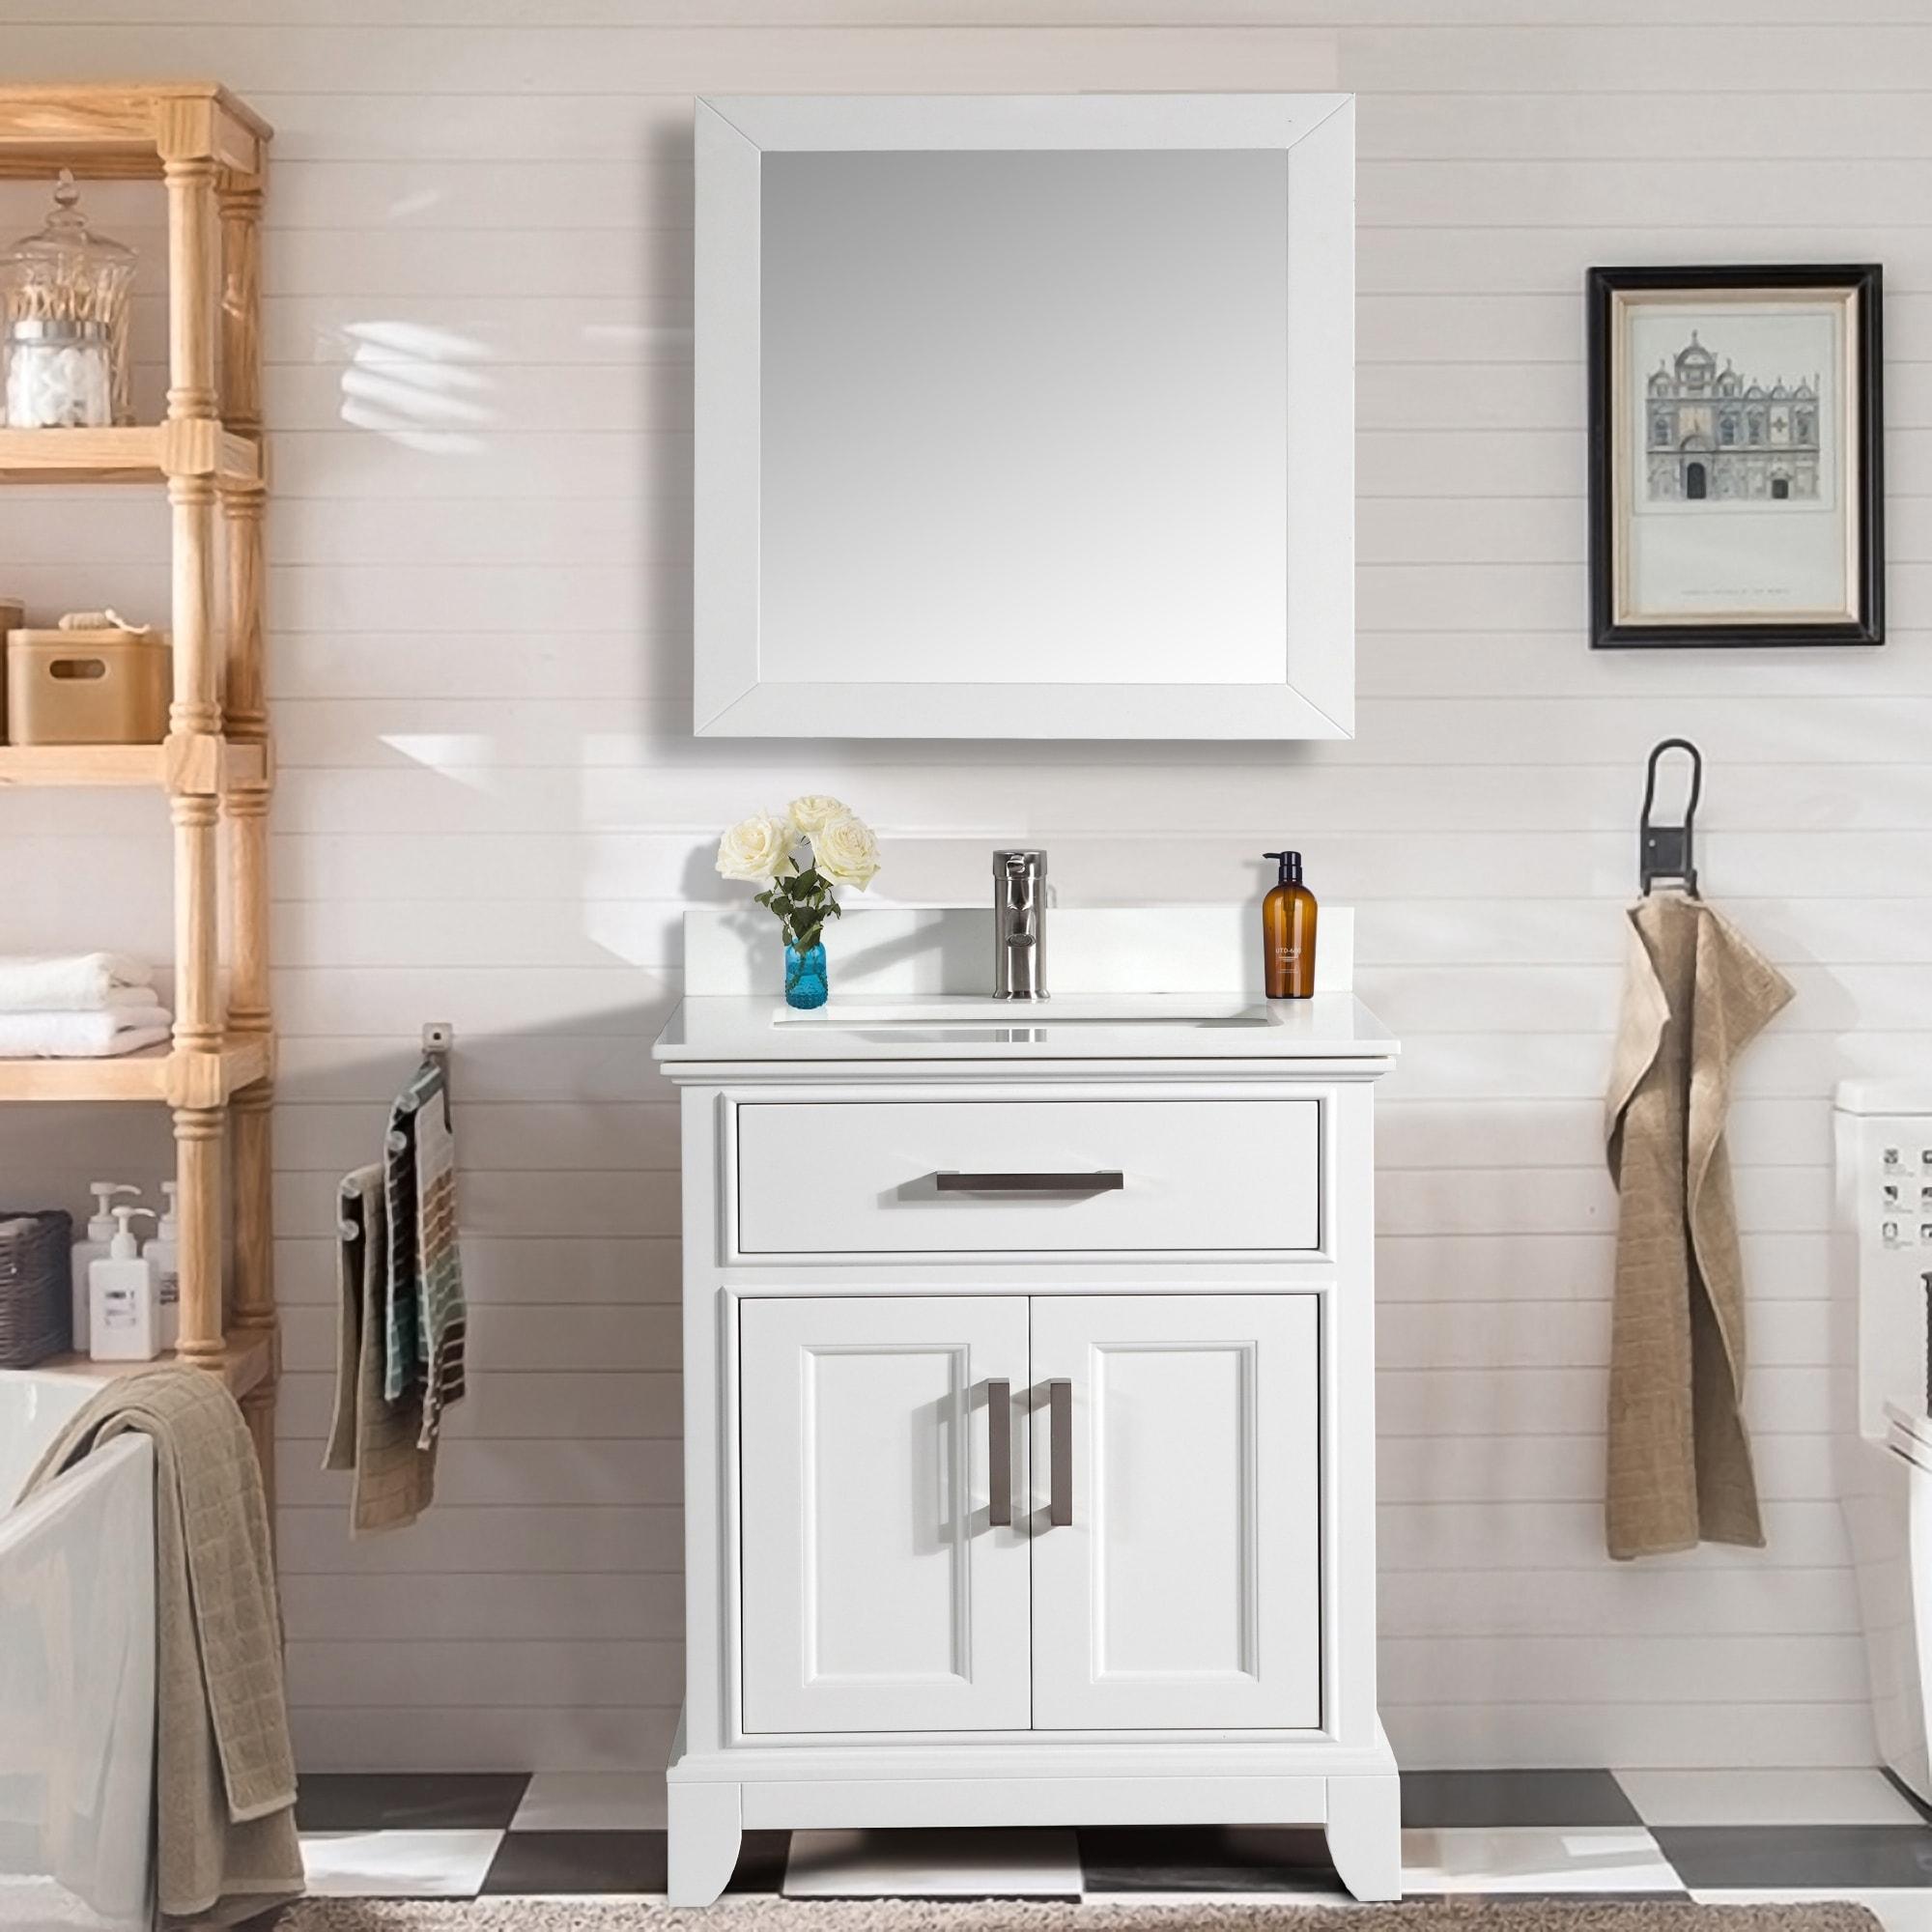 Vanity Art 30 Inch Single Sink Bathroom Vanity Set White Phoenix Stone Top 1 Drawer 1 Shelf Undermount Sink With Free Mirror Overstock 12364440